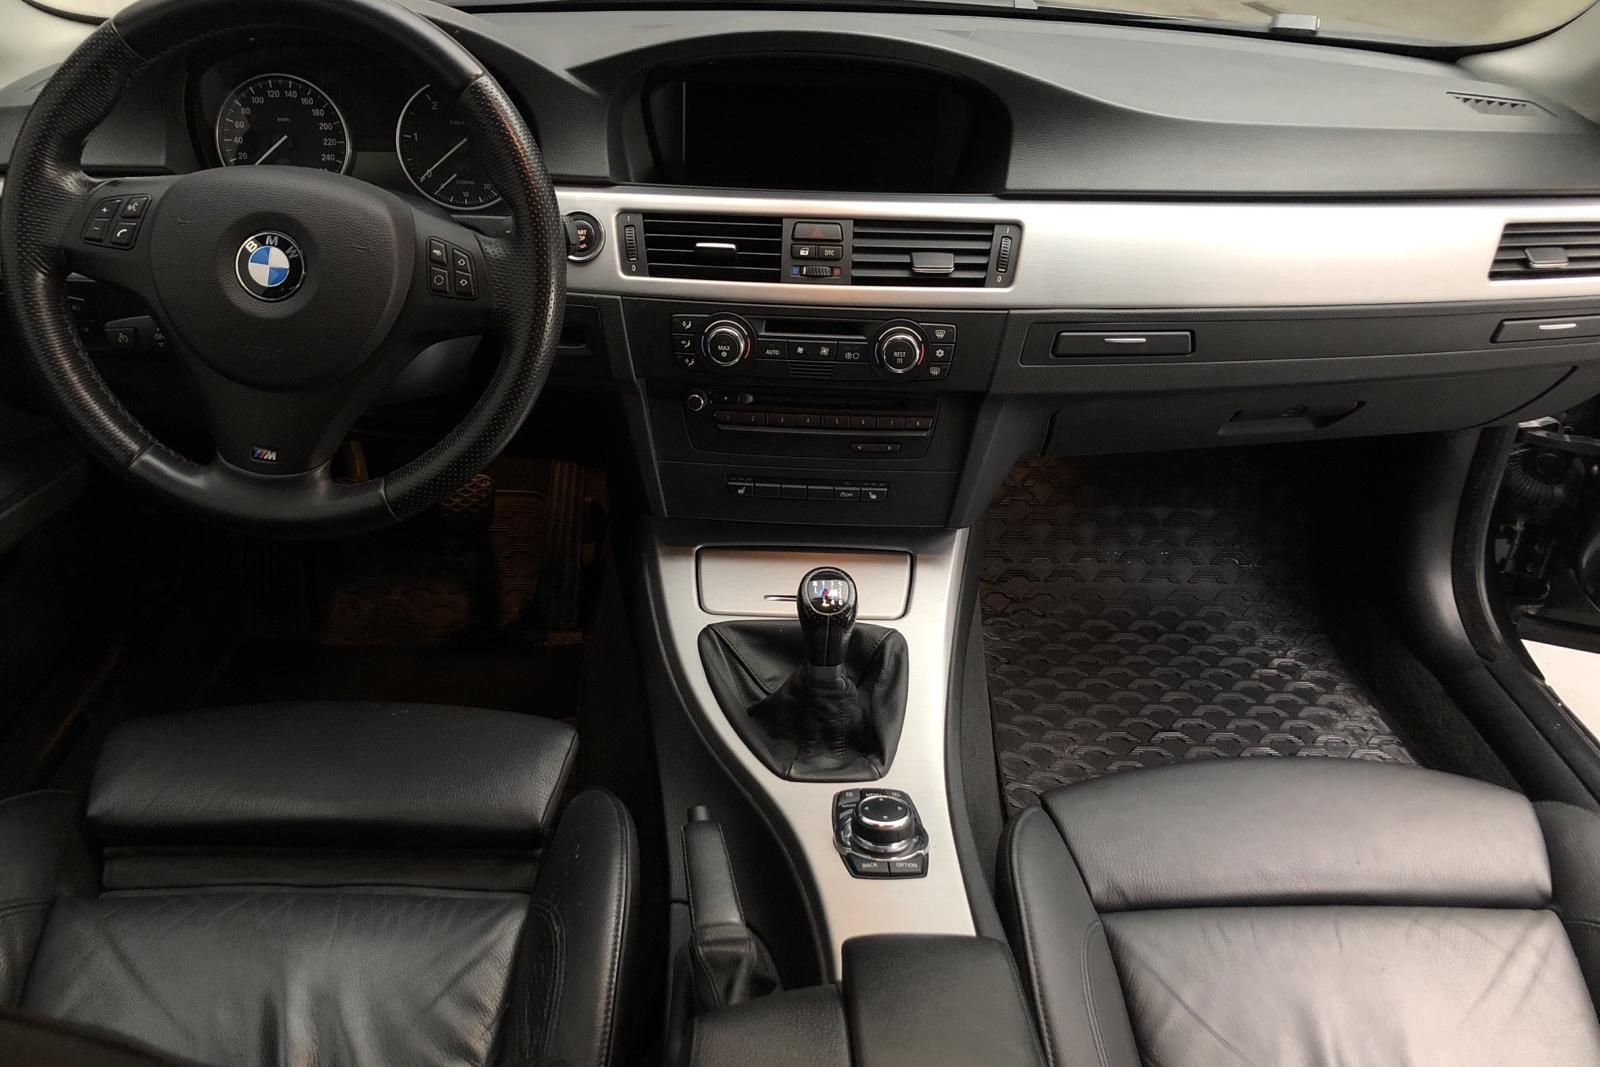 BMW 320d Coupé, E92 (177hk) - 97 220 km - Manual - black - 2010